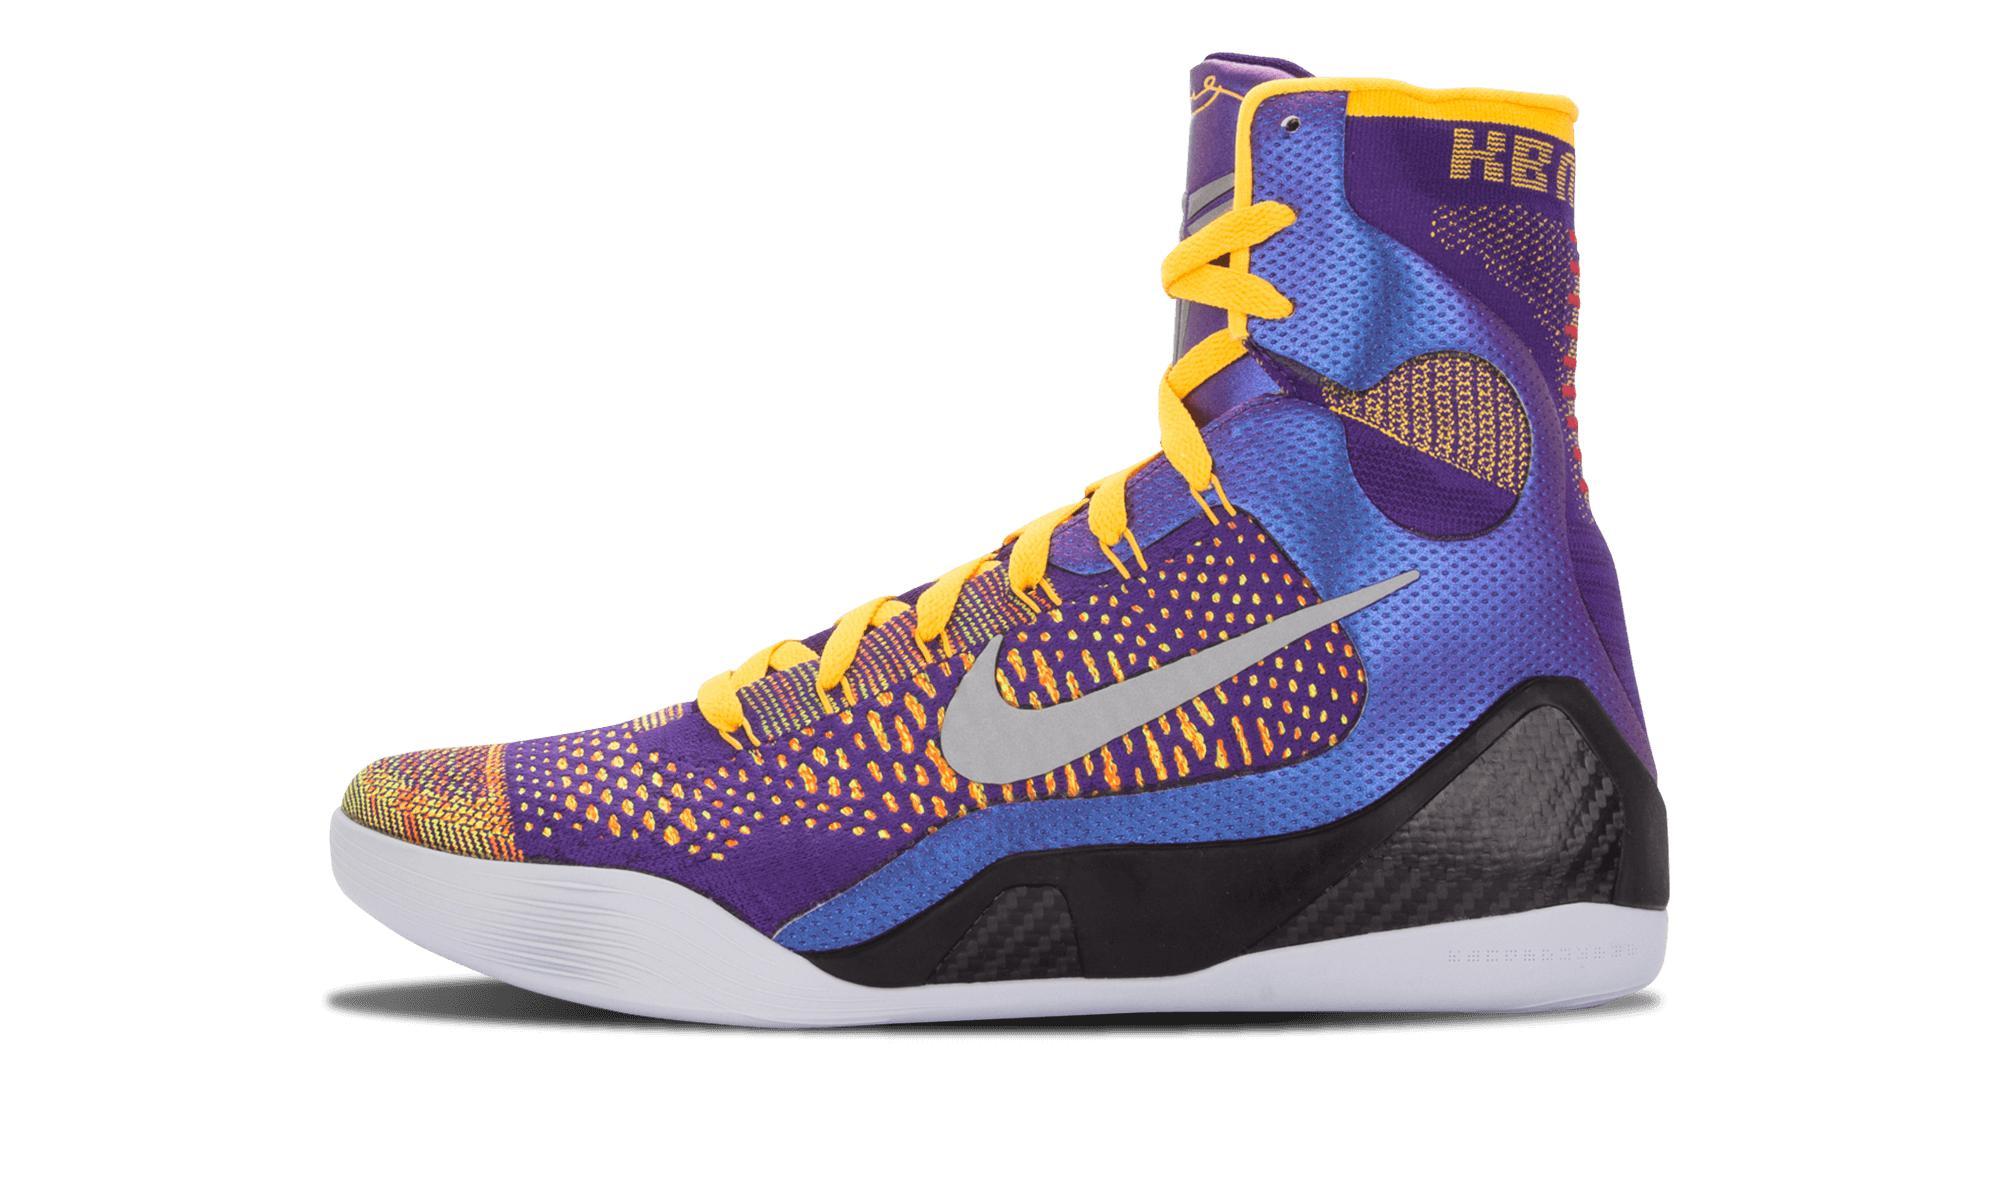 97219bdc228d Lyst - Nike Kobe 9 Elite Xdr in Purple for Men